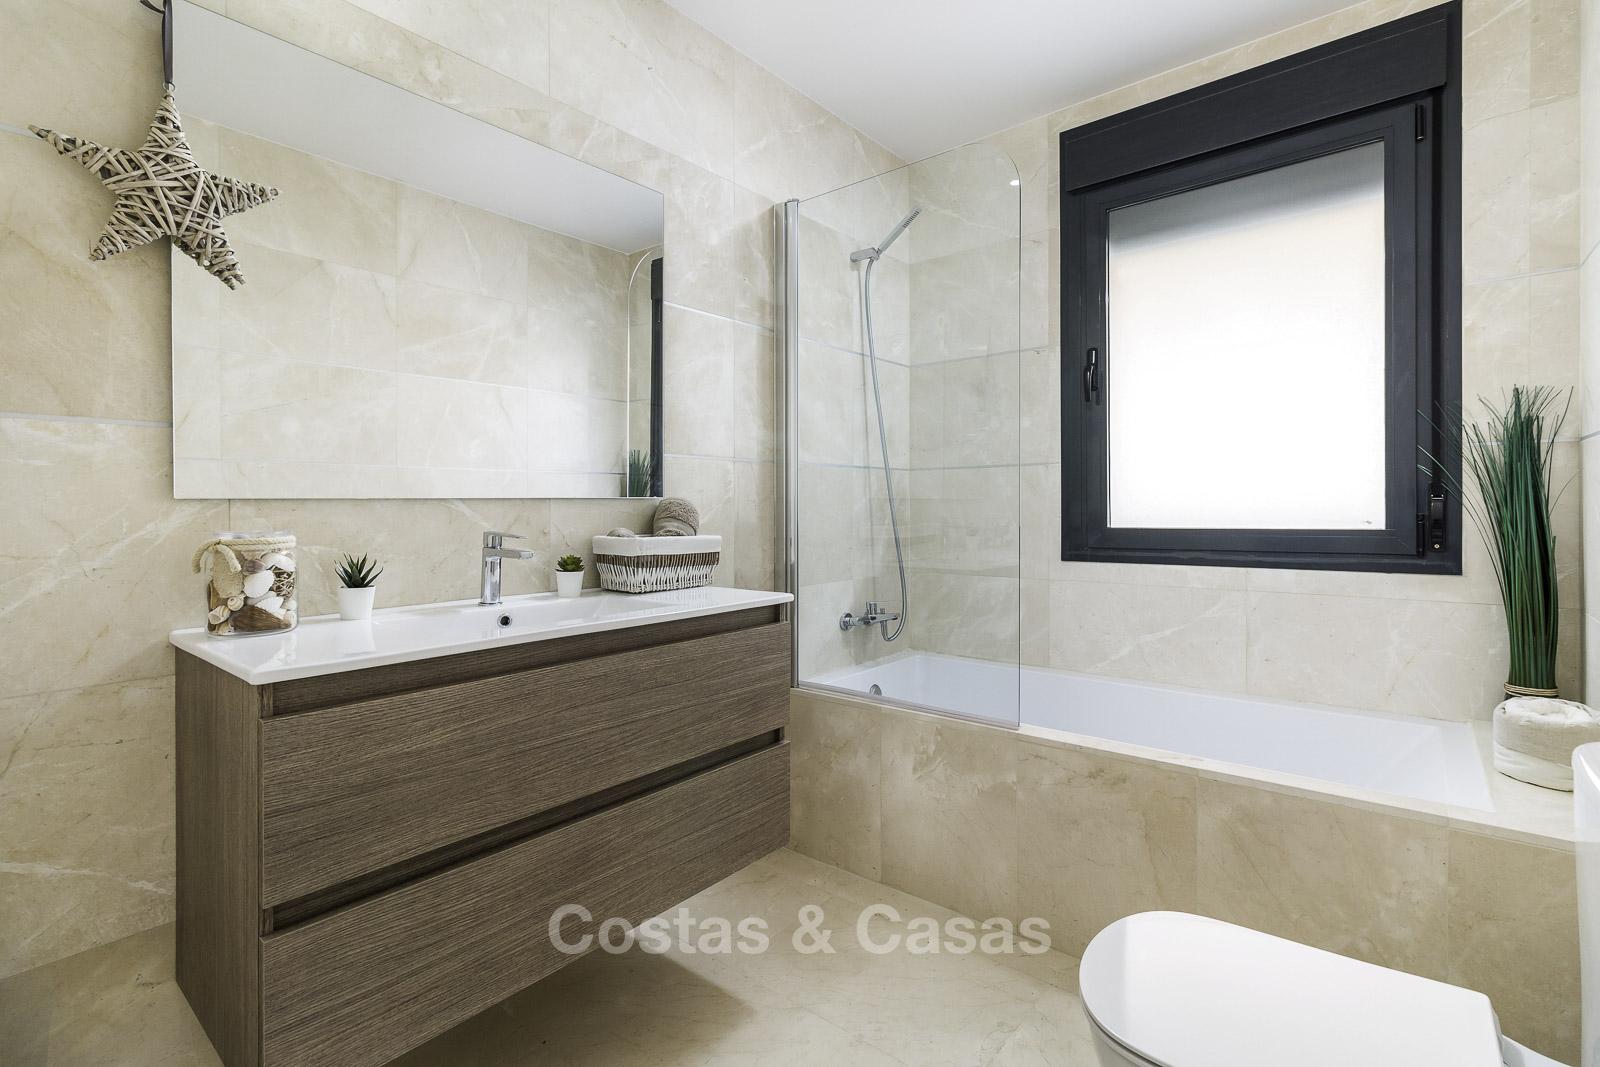 new frontline golf apartments for sale sea views Casares Costa del Sol